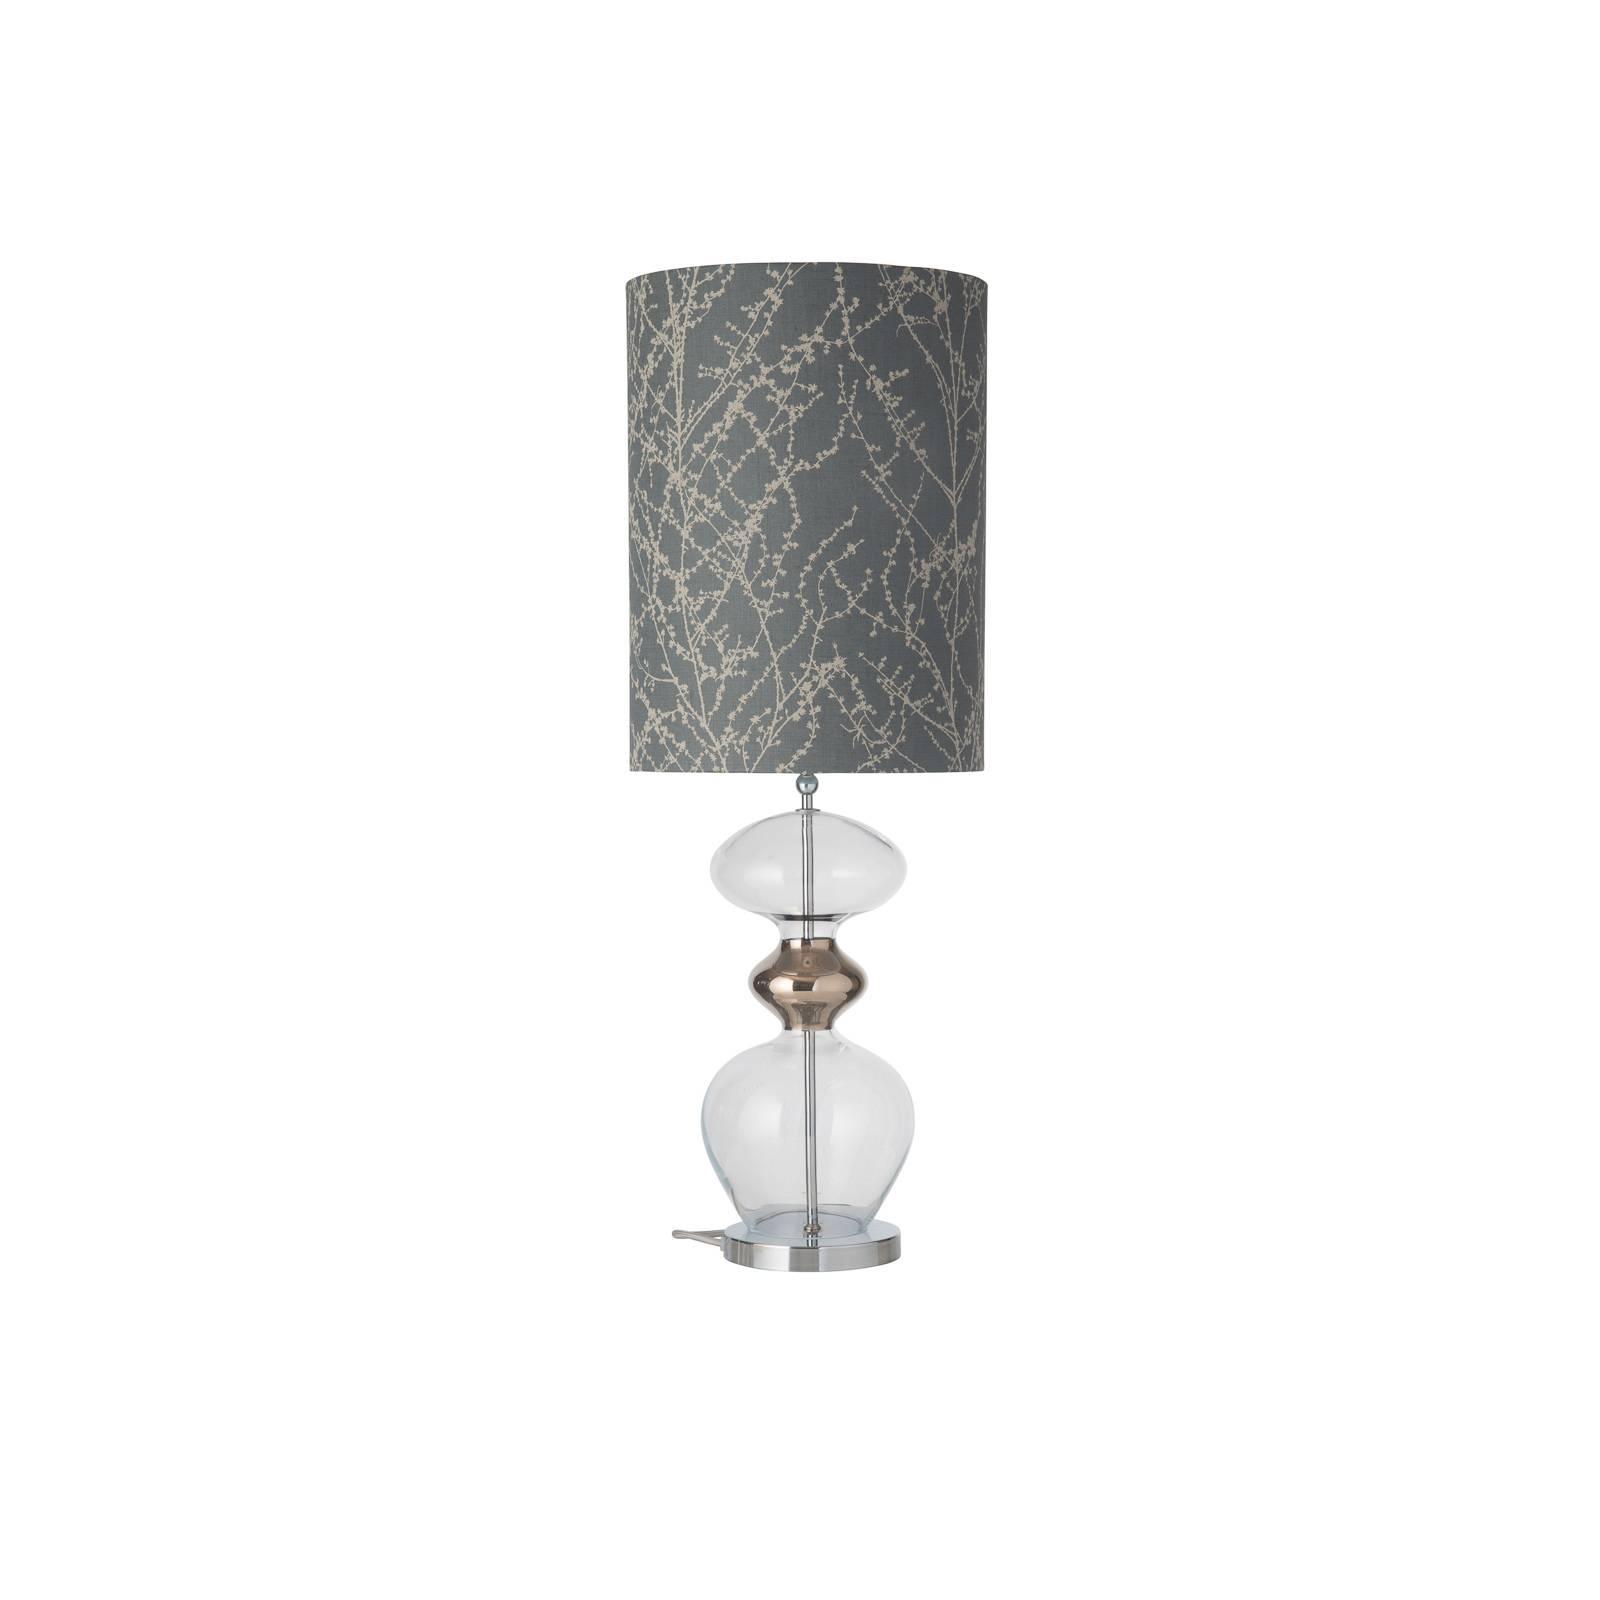 EBB & FLOW Futura lampe à poser, grey/silver